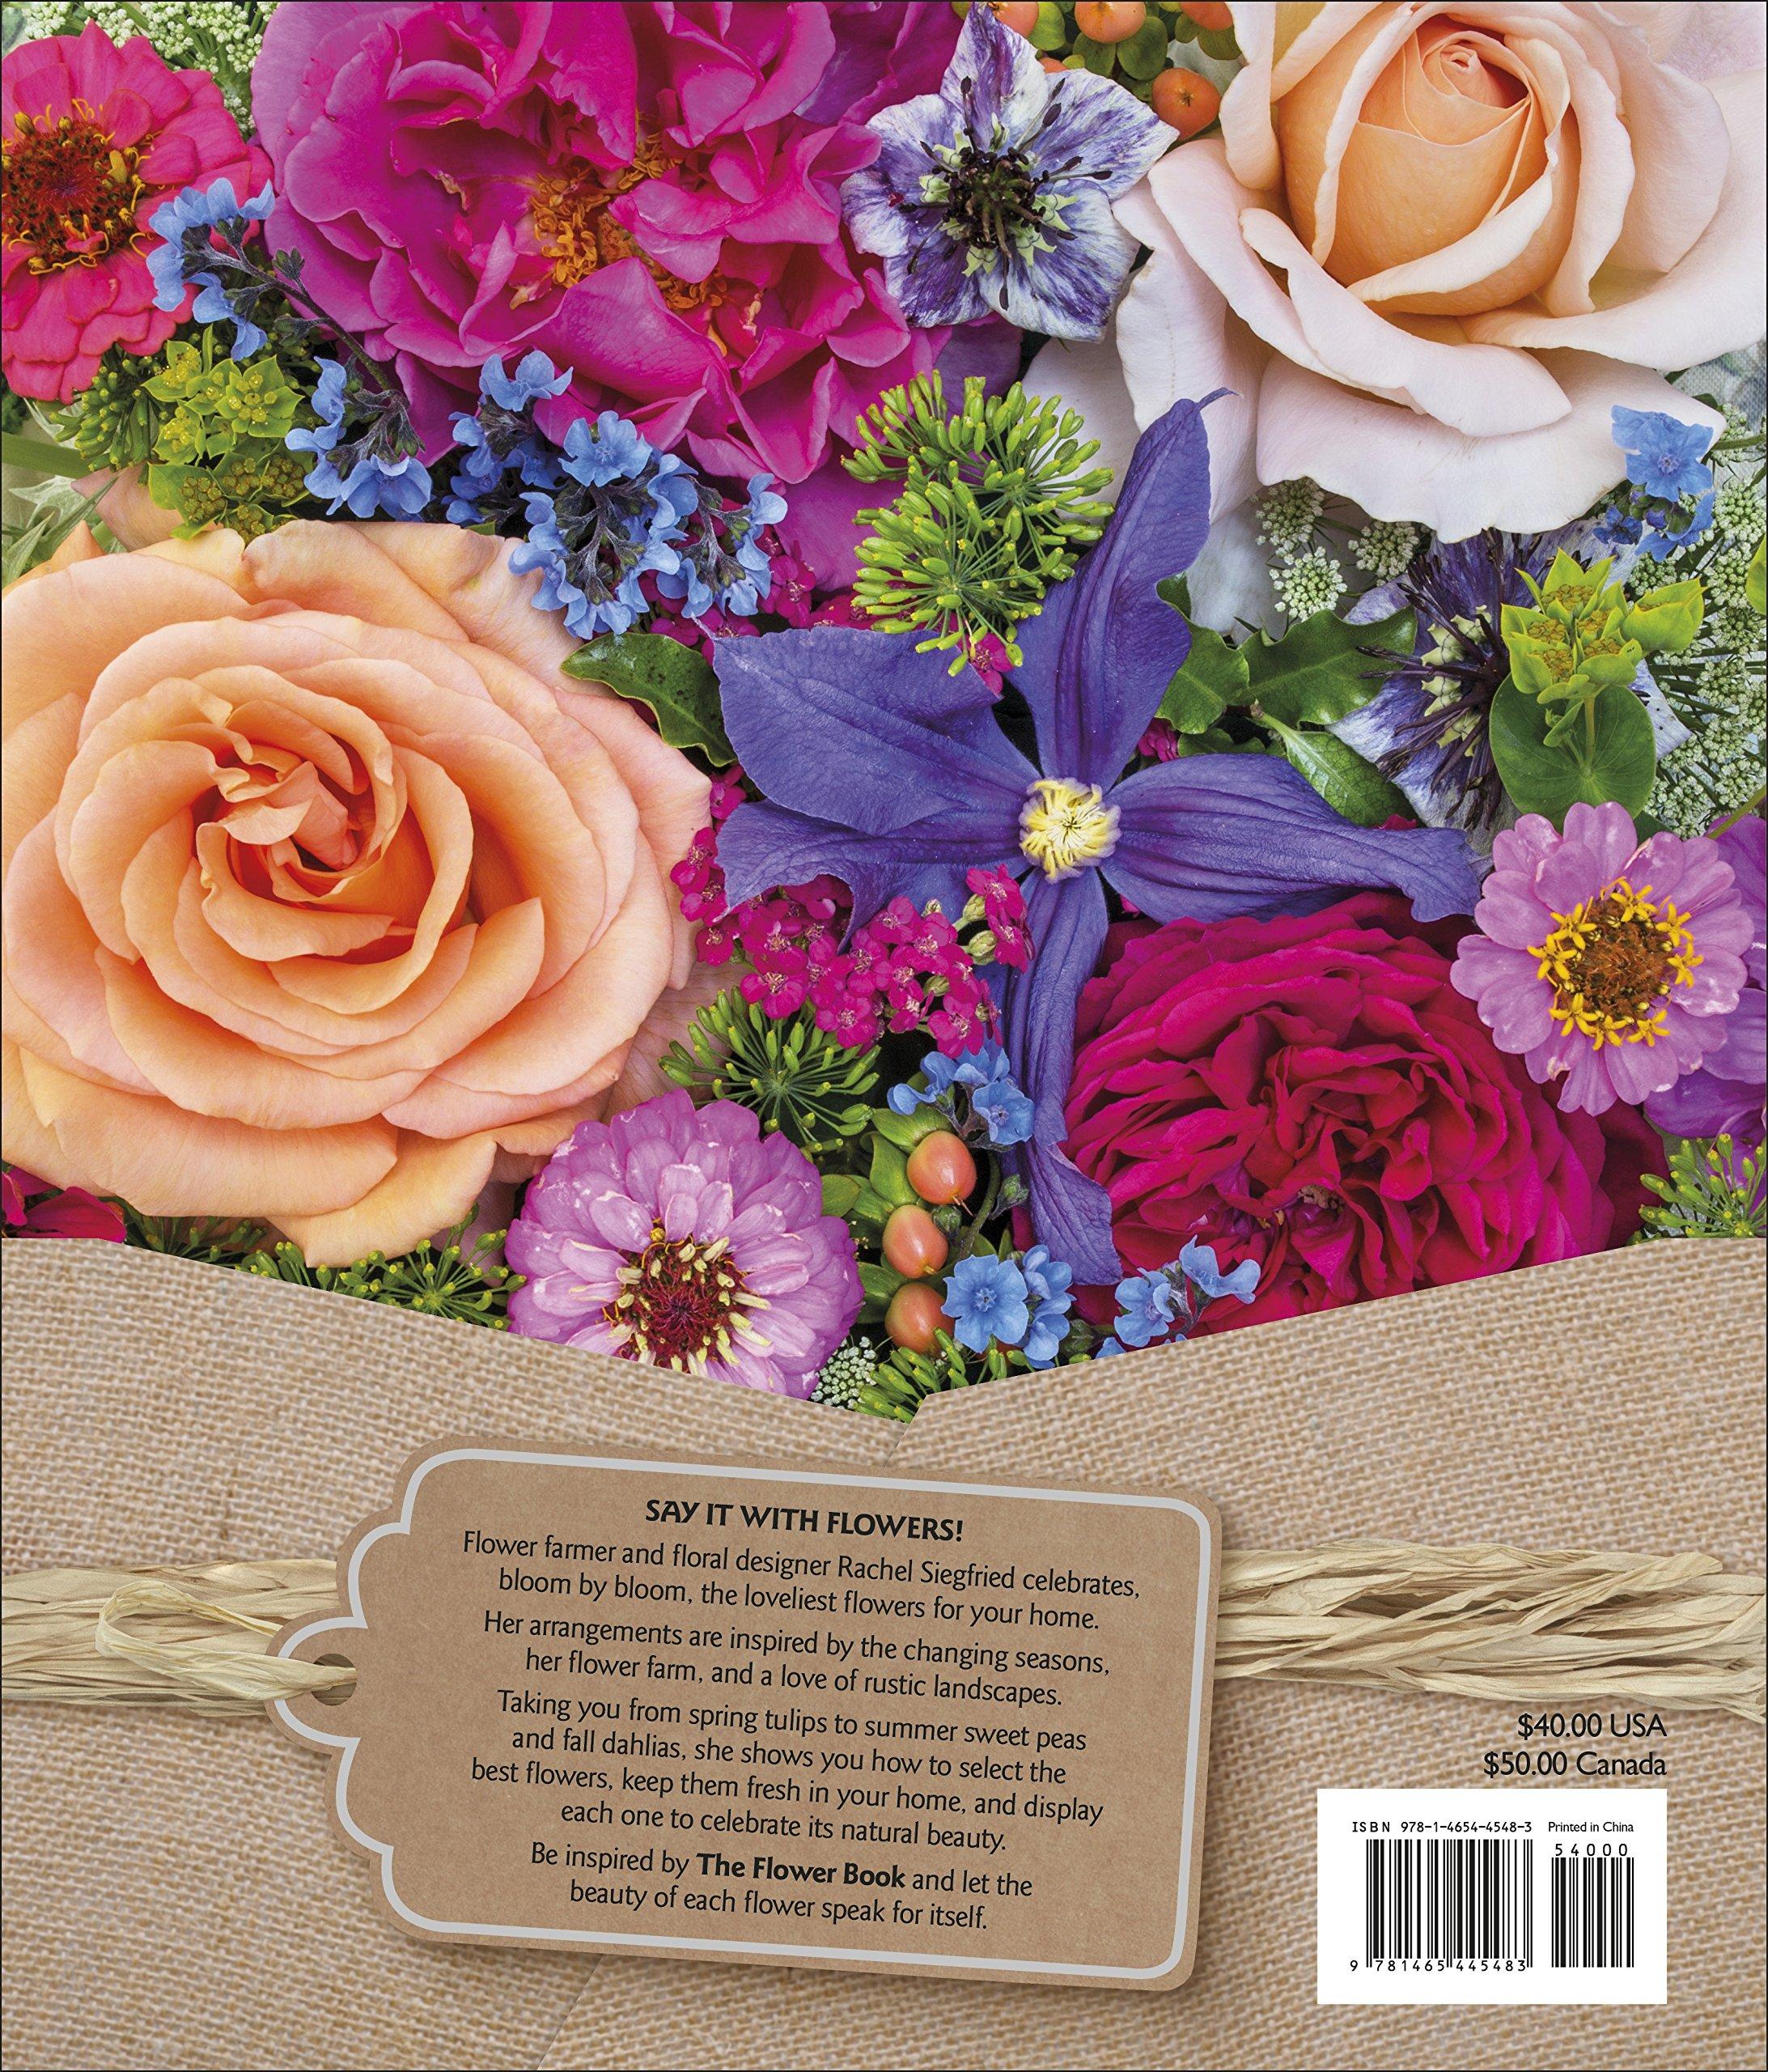 9de0c8ea0663ca The Flower Book  Let the Beauty of Each Bloom Speak for Itself ...